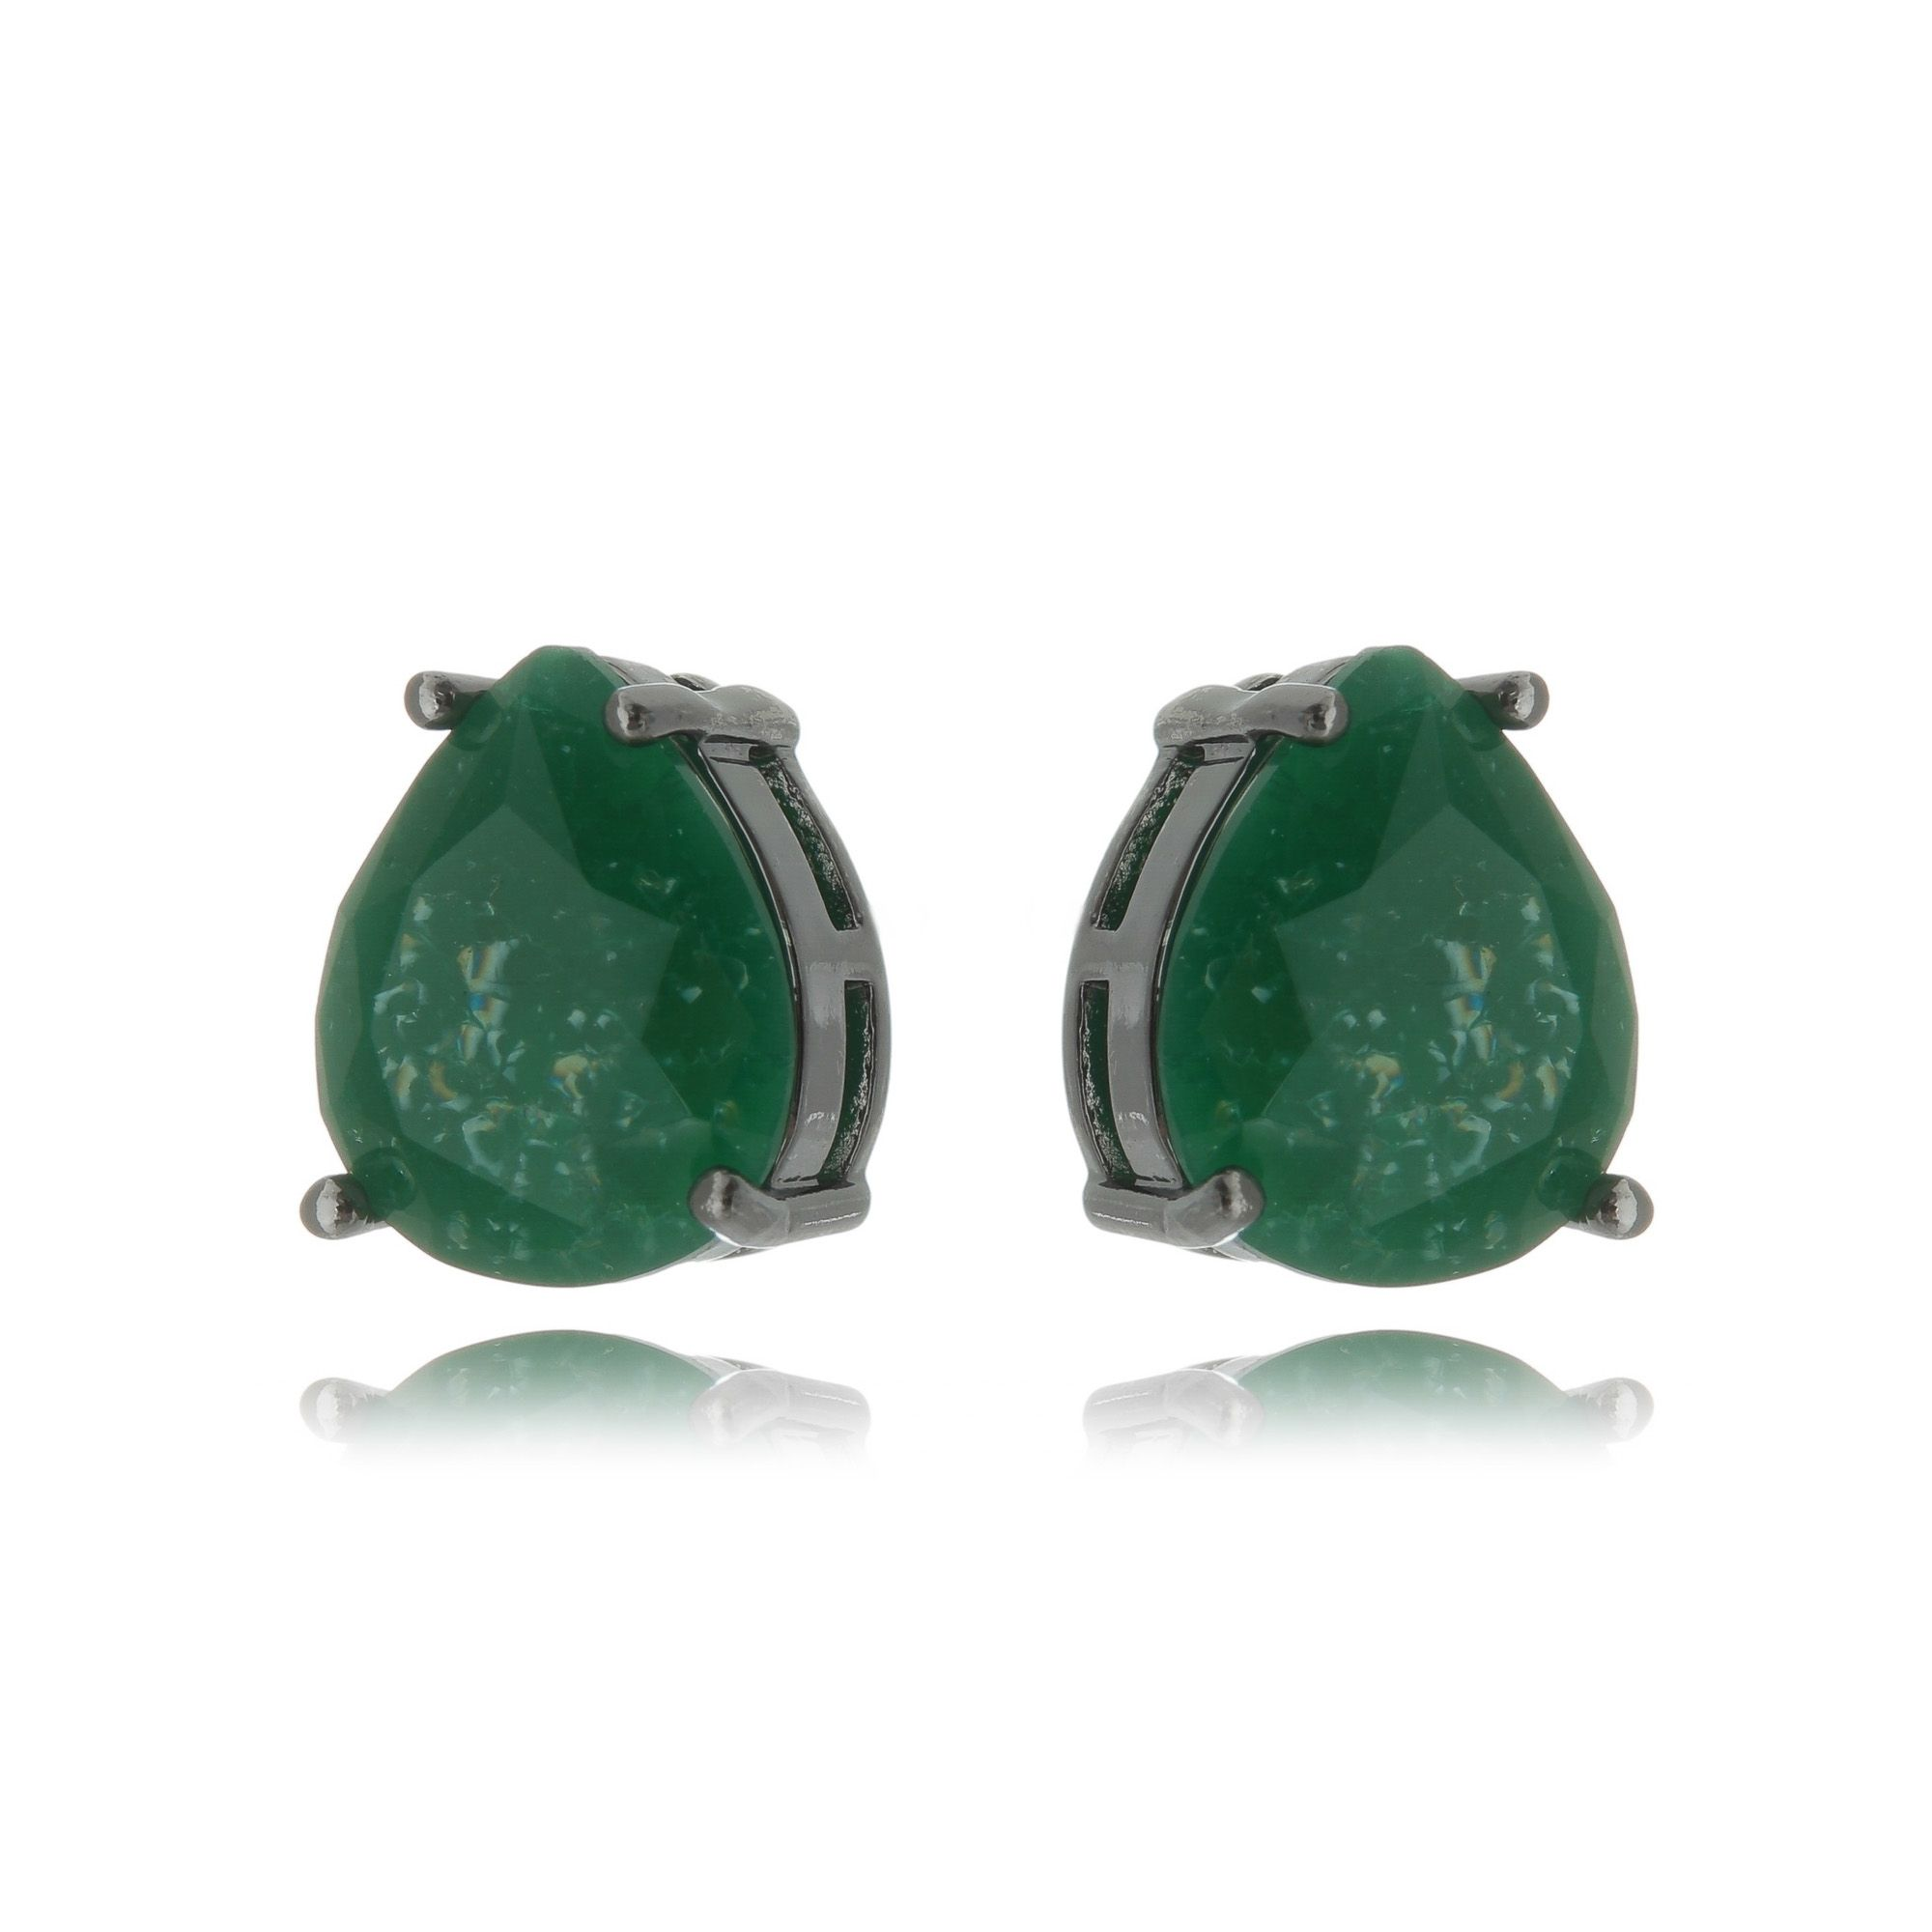 Brinco Fusion Verde Esmeralda Gota 10 x 12 mm Semijoia Fina em Ródio Negro  - Soloyou